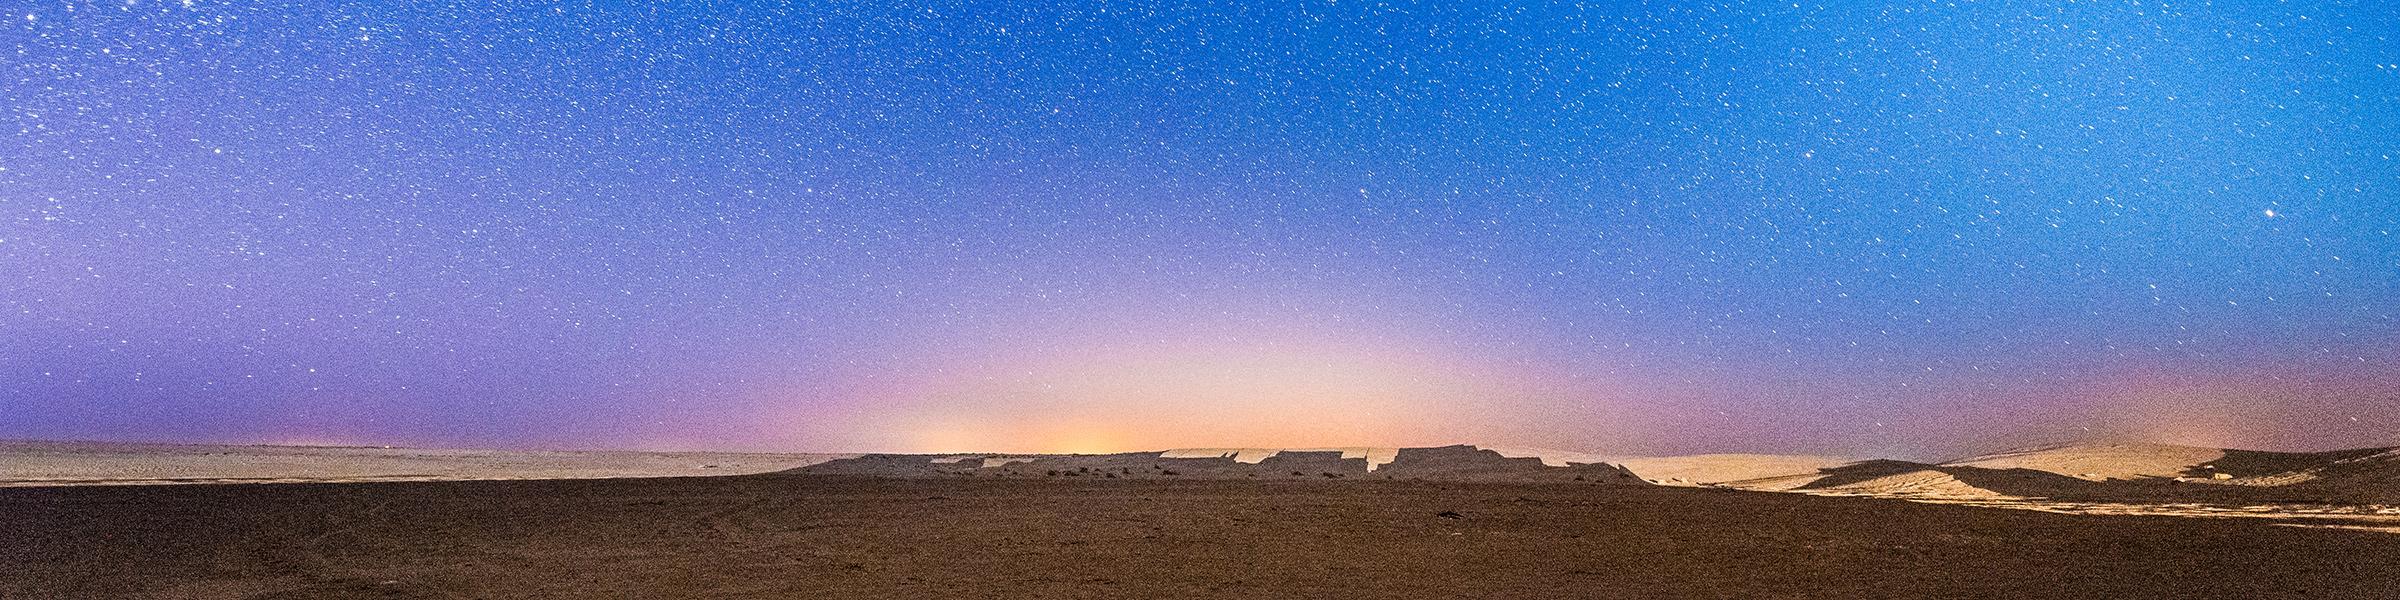 Tunisia Tozeur Sahara Desert